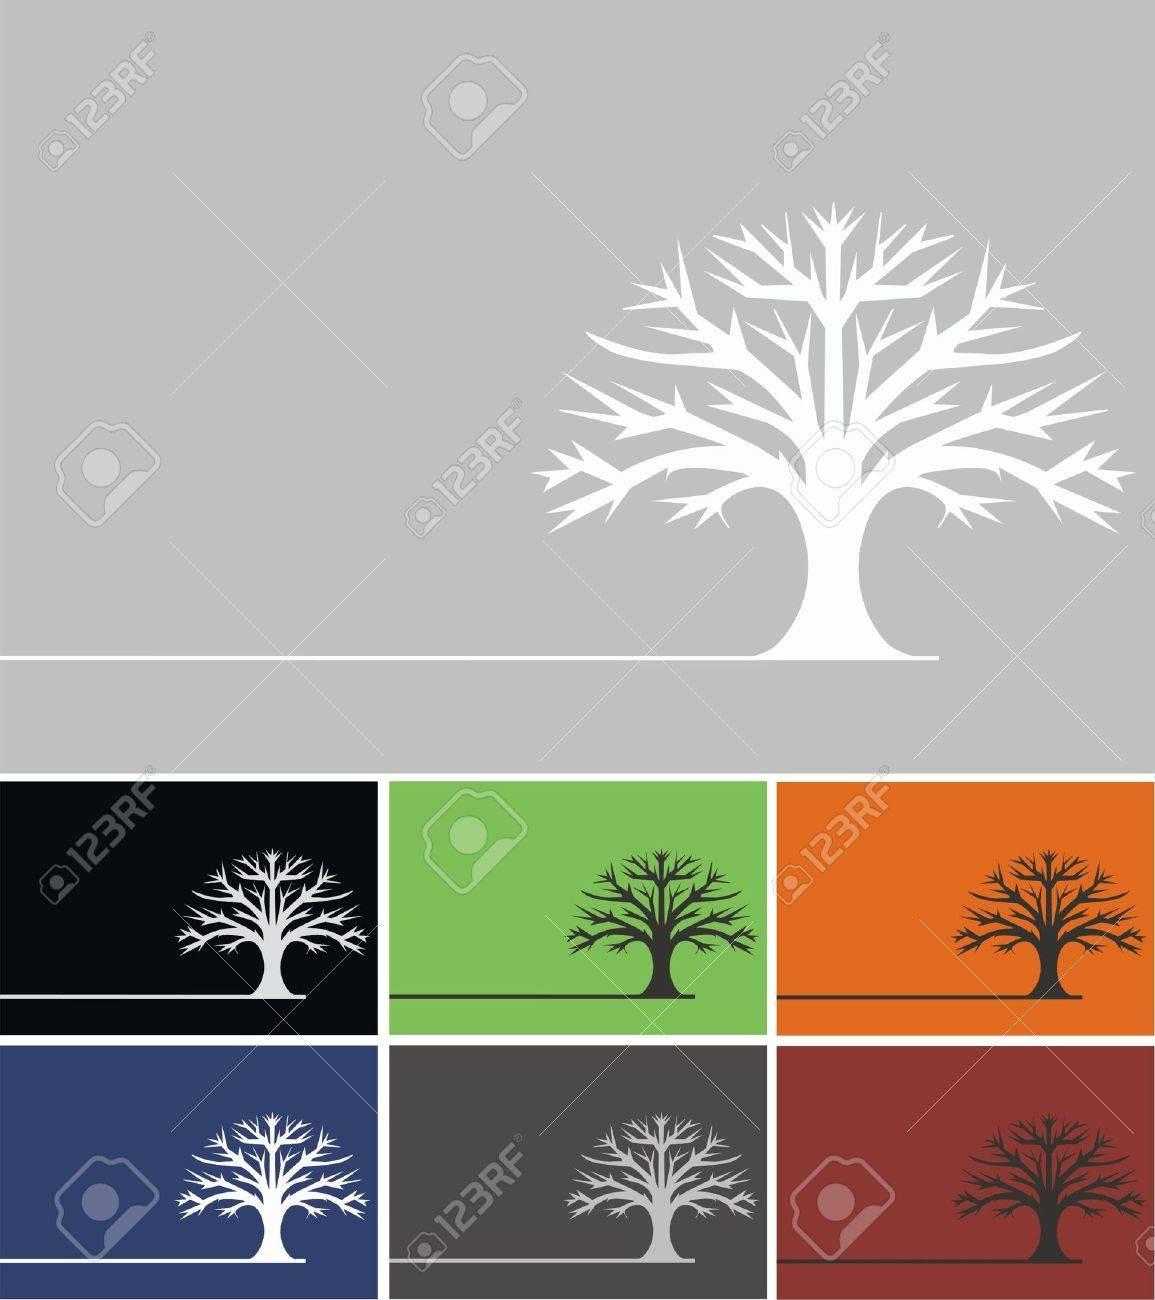 Oak Tree Royalty Free Cliparts, Vectors, And Stock Illustration ...